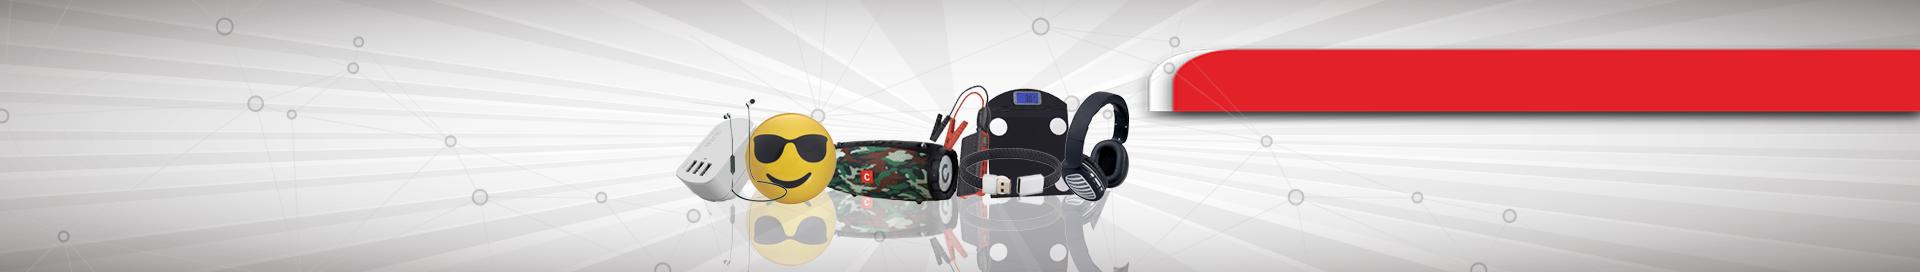 USB, גאדג'טים,מוצרי מחשב וחשמל